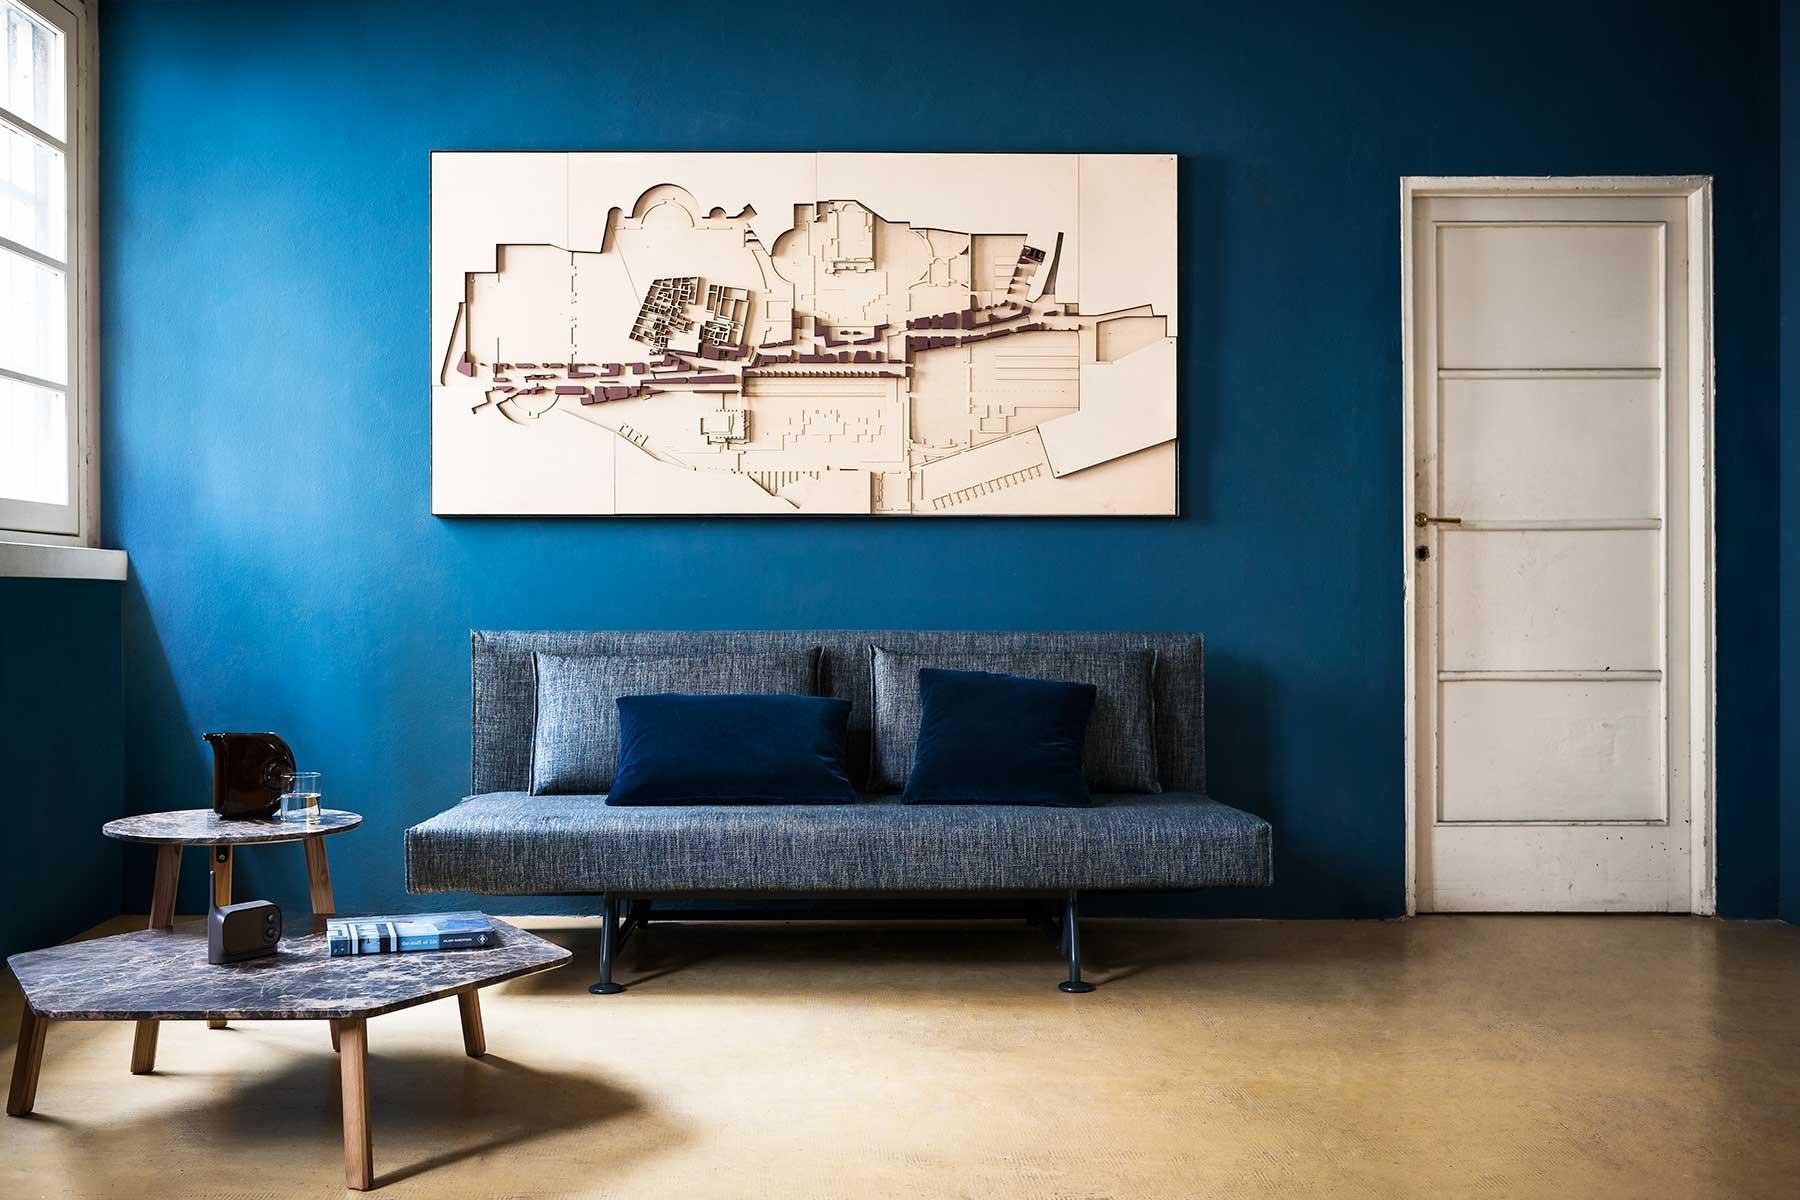 Sliding Sofa from Tacchini, designed by Pietro Arosio